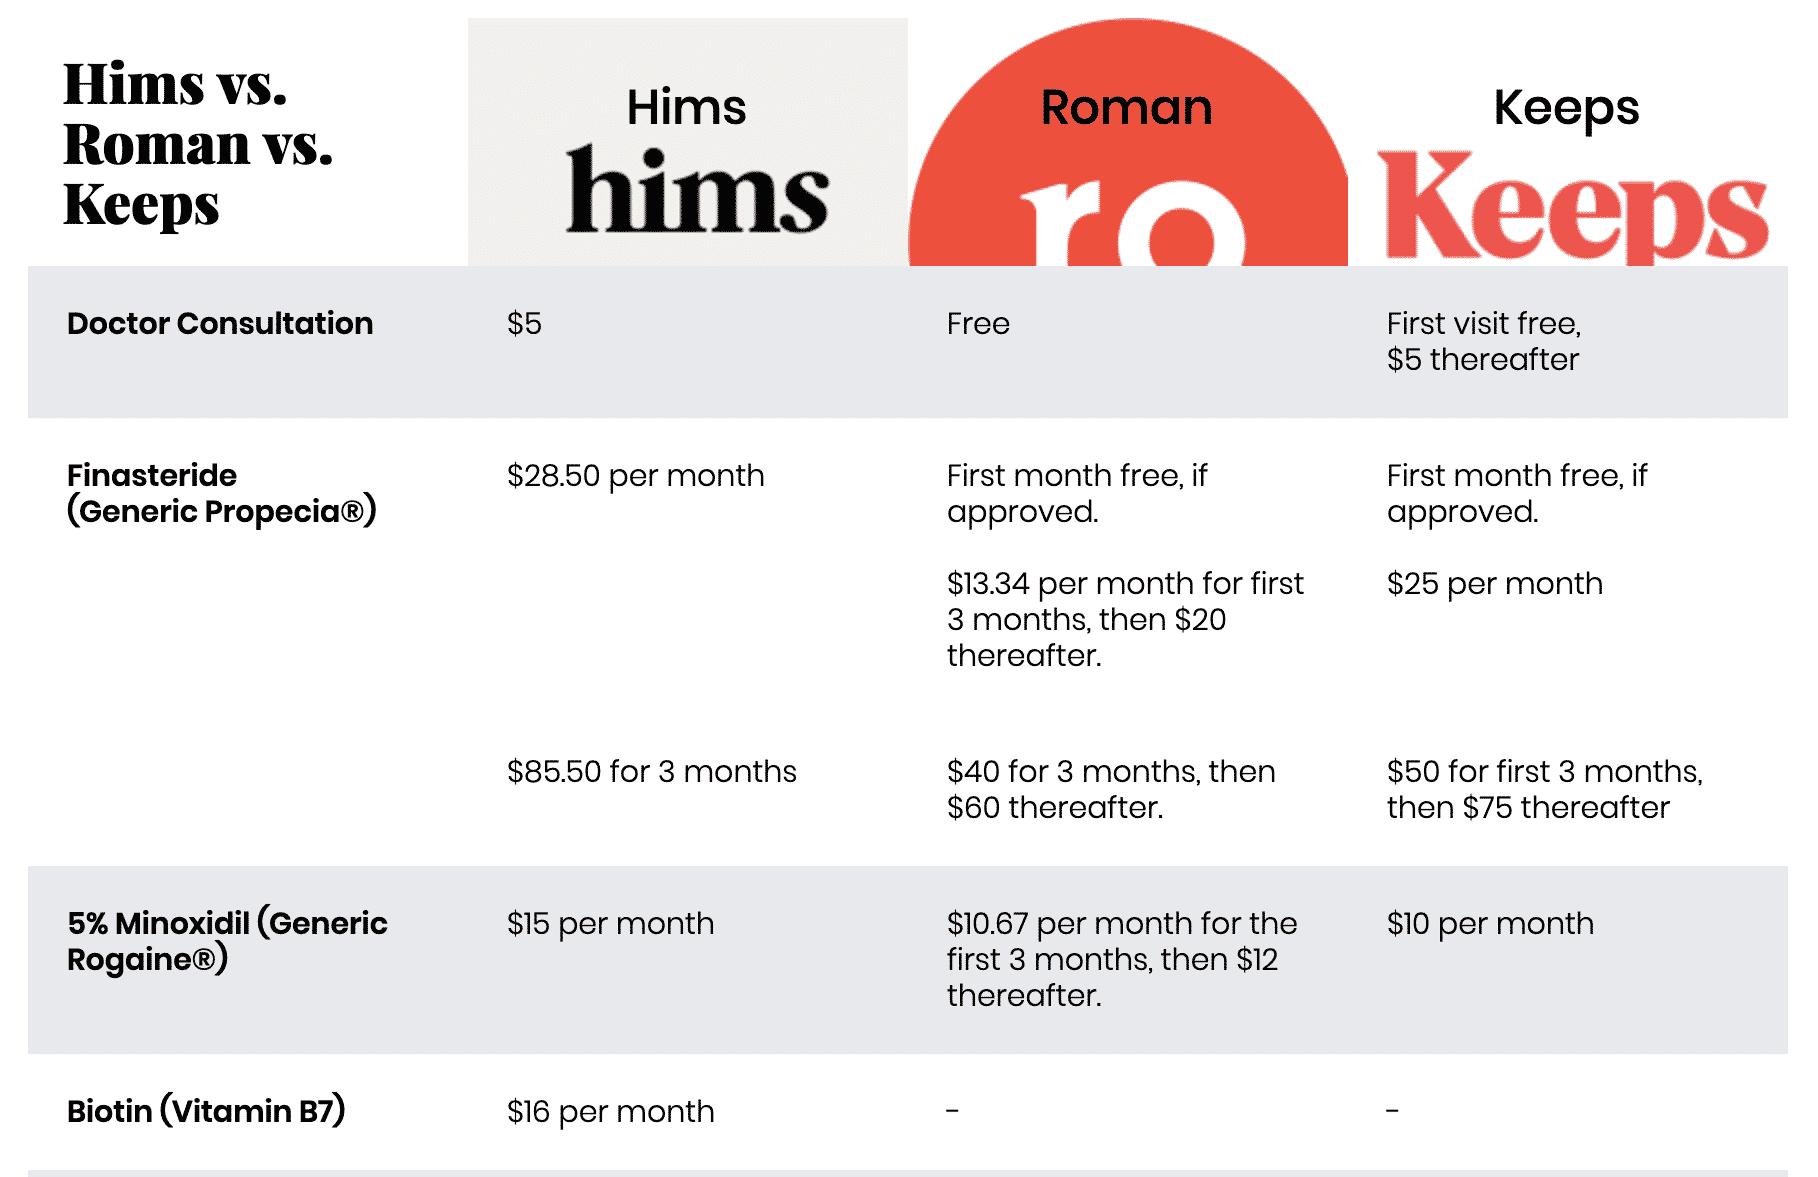 Hims vs Roman vs Keeps: Do Hair Loss Subscriptions Work